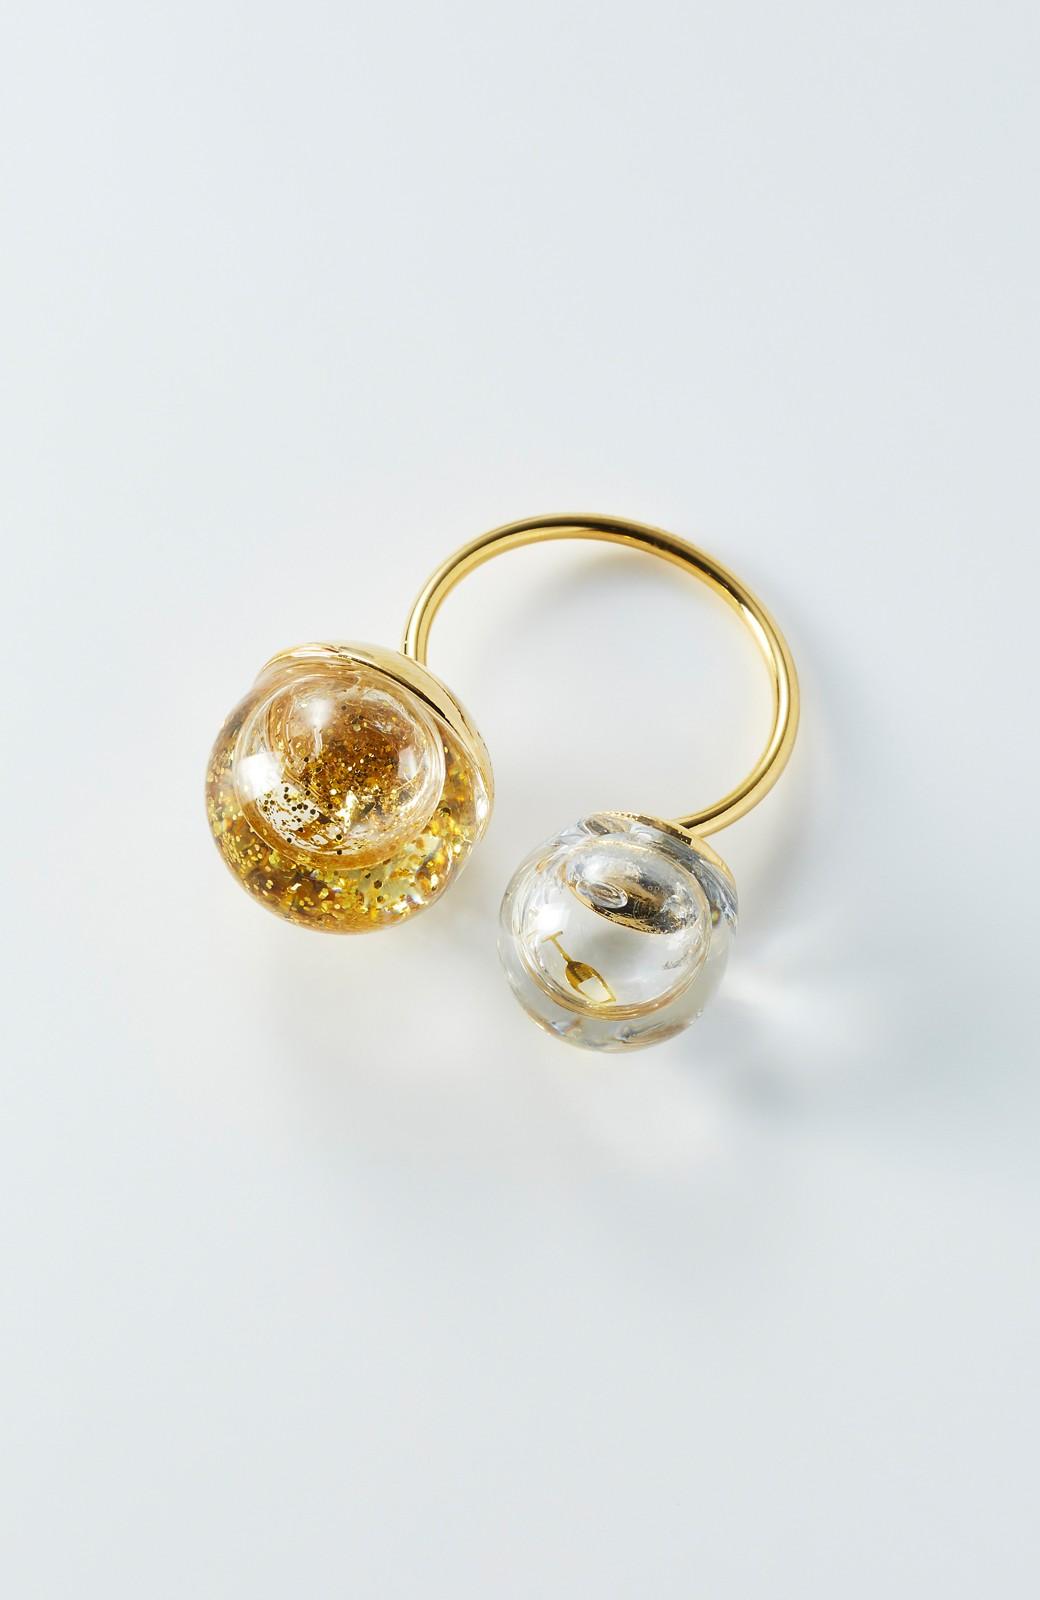 haco! てとひとて KANA MATSUNAMI チャリティー企画 W Glass dome リング <ゴールド>の商品写真1